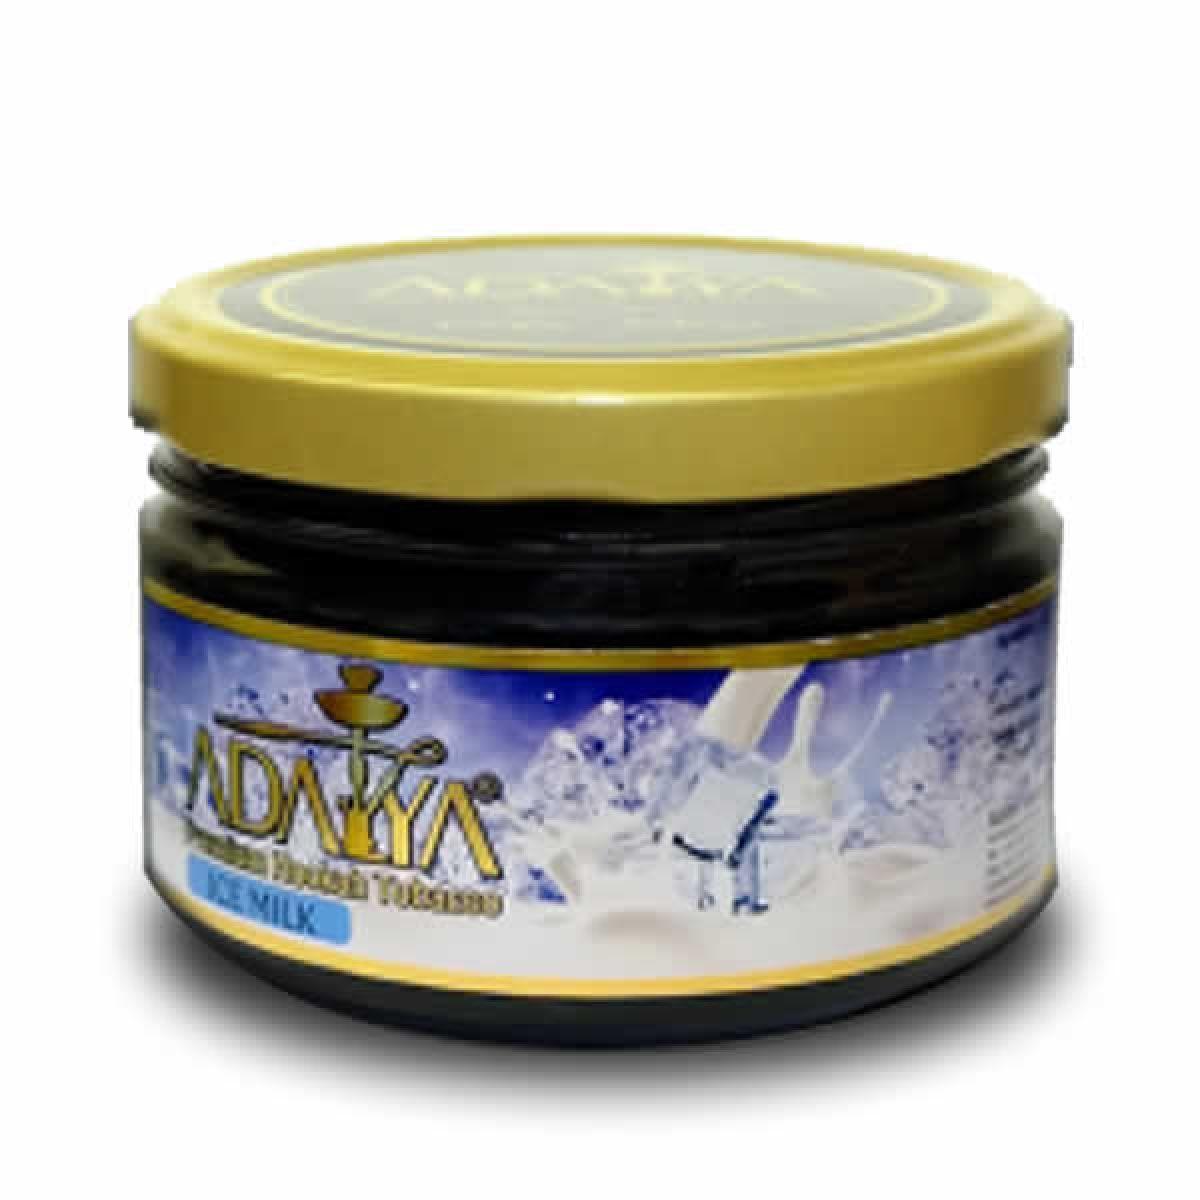 ADALYA ICE MILK 200G